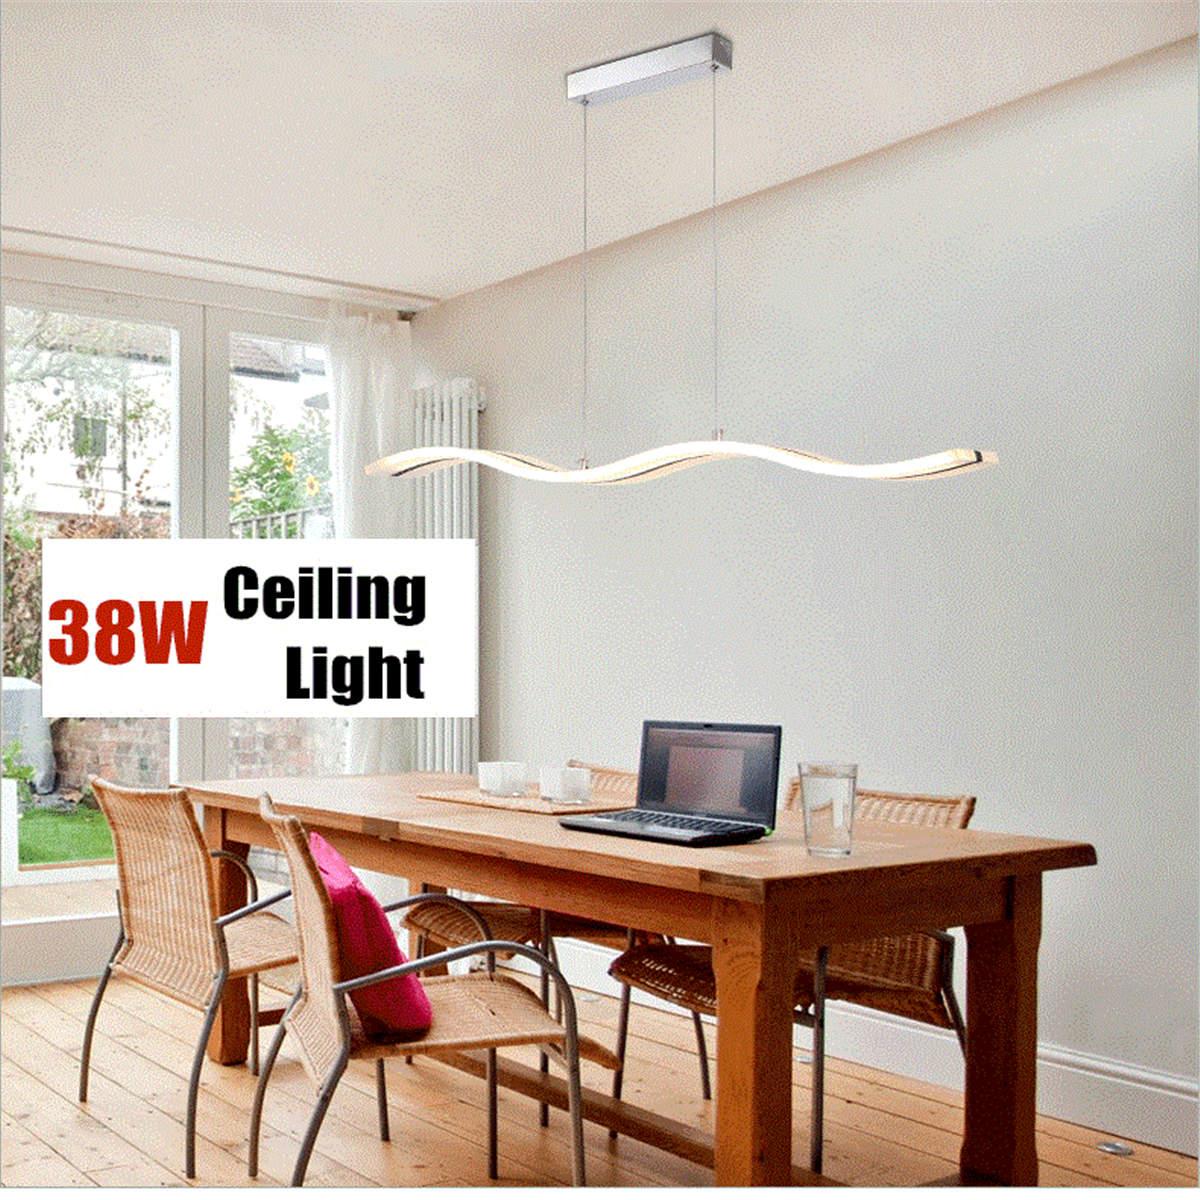 Modern Chandelier Wave LED Chandelier Light - Stylish Decorative Ceiling Light For Living Dining And Bedrooms Best Children's Lighting & Home Decor Online Store